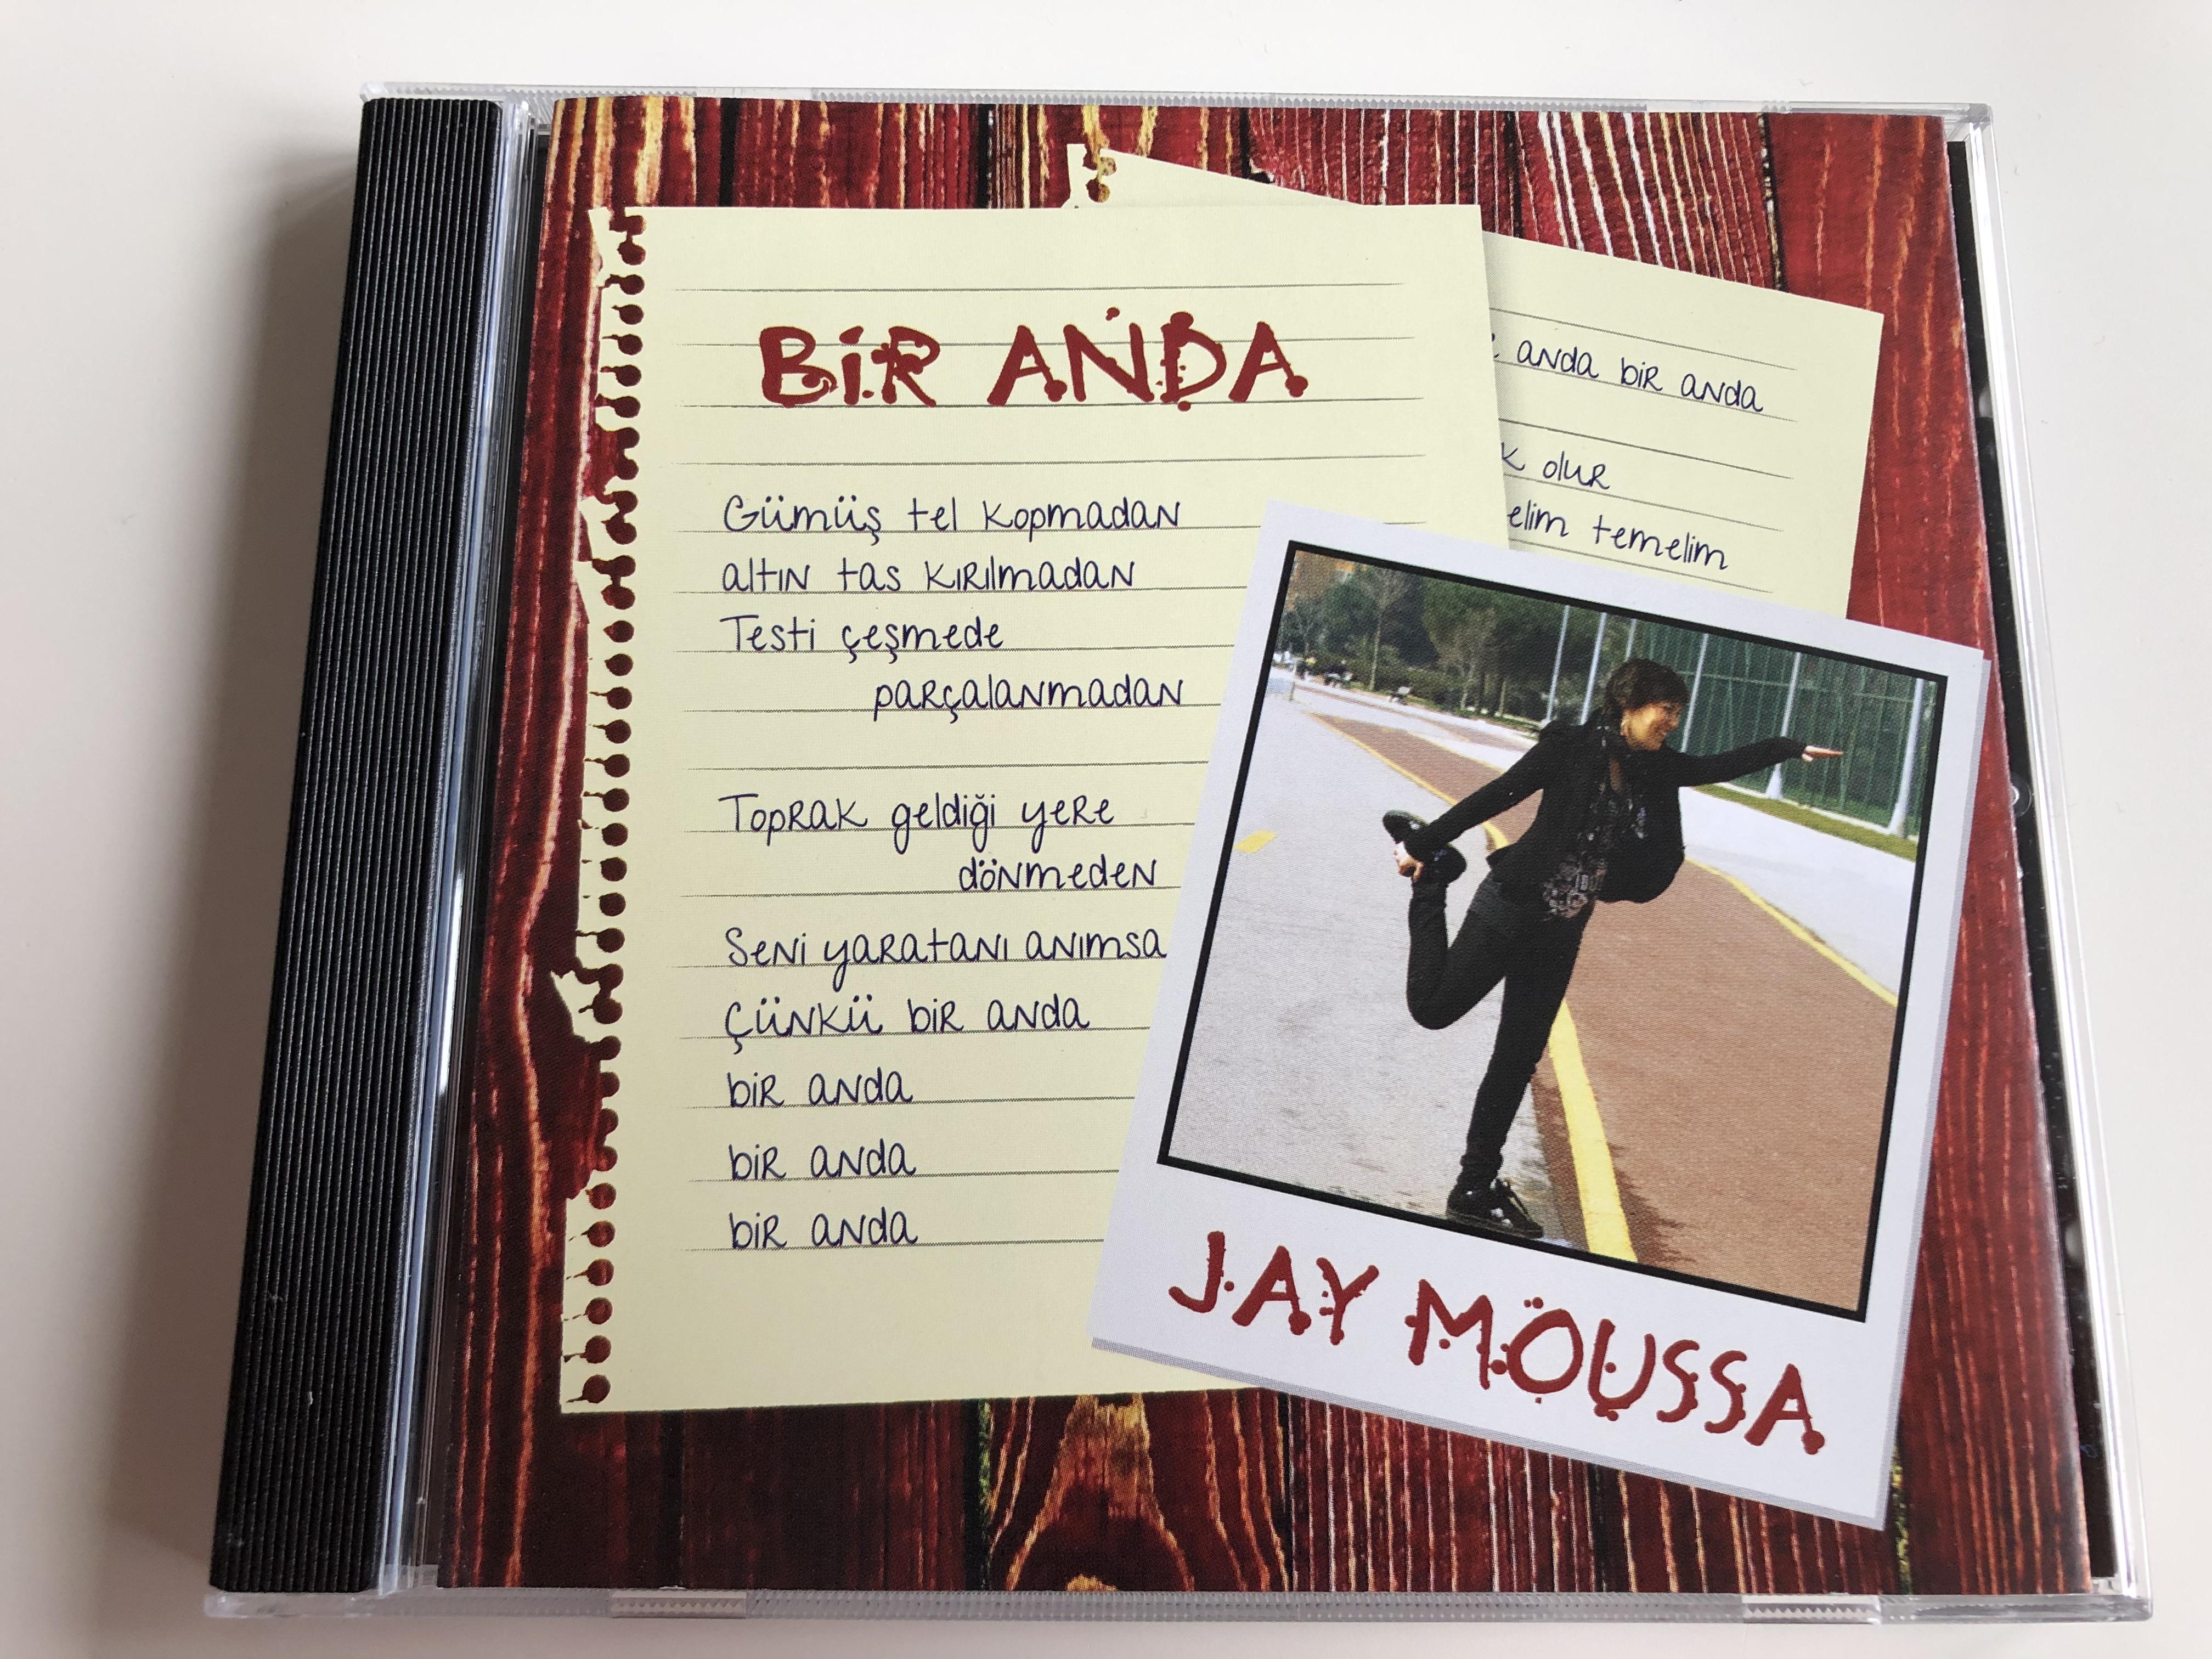 bir-anda-jay-moussa-turkish-cd-2013-suddenly-1-.jpg